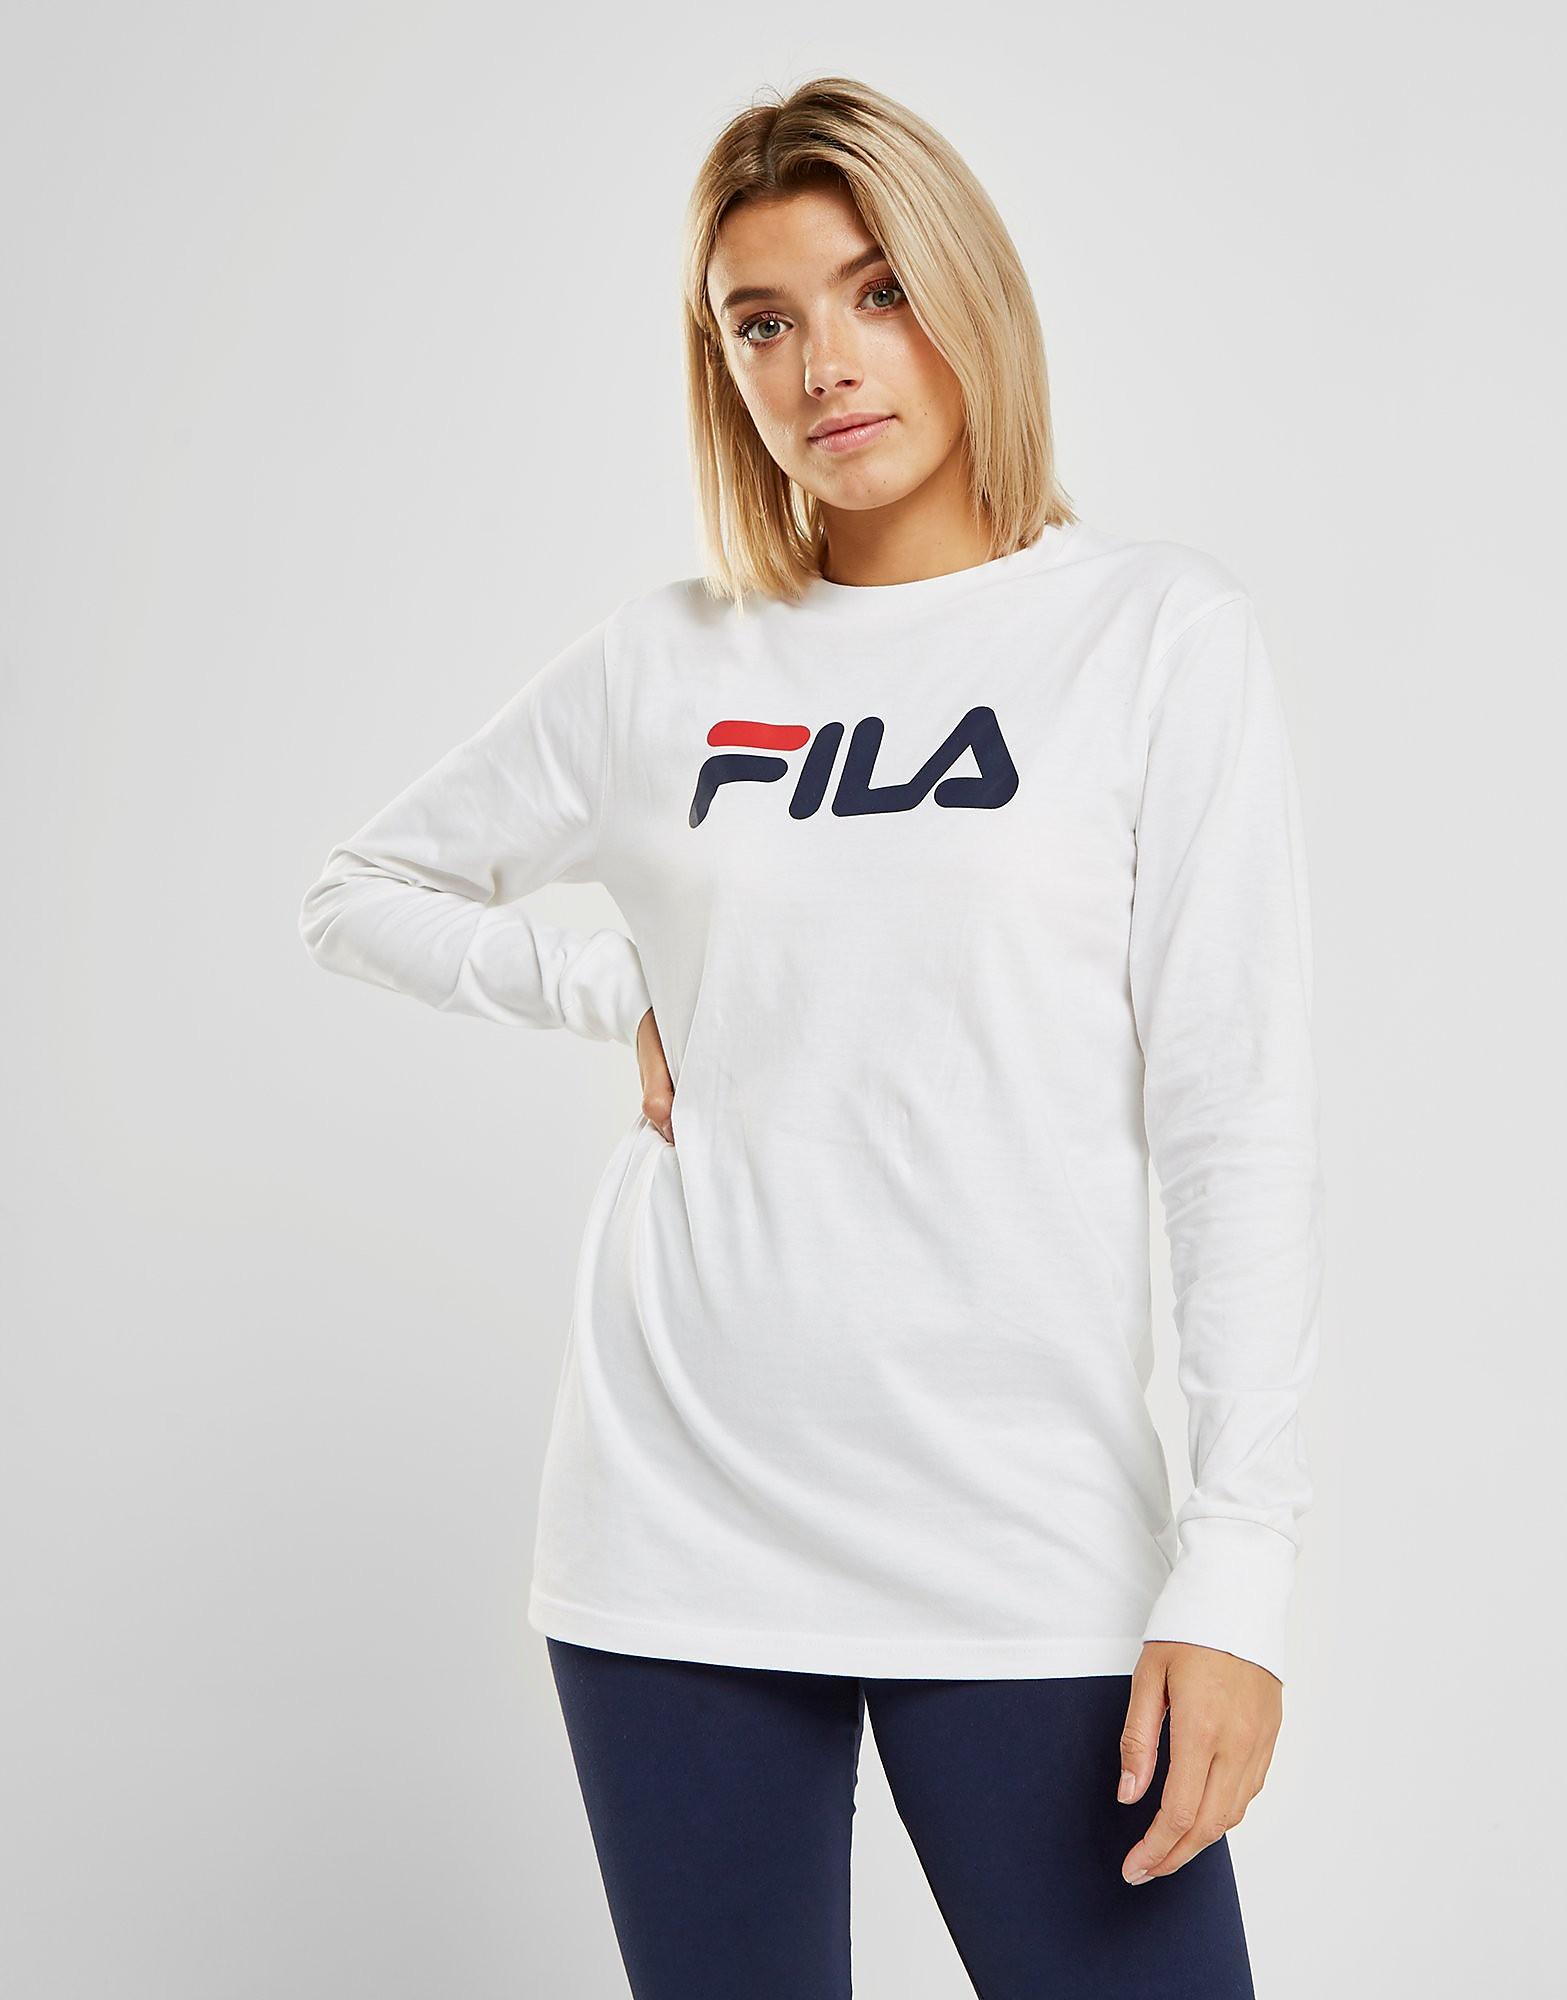 Fila Long Sleeve Boyfriend T-Shirt